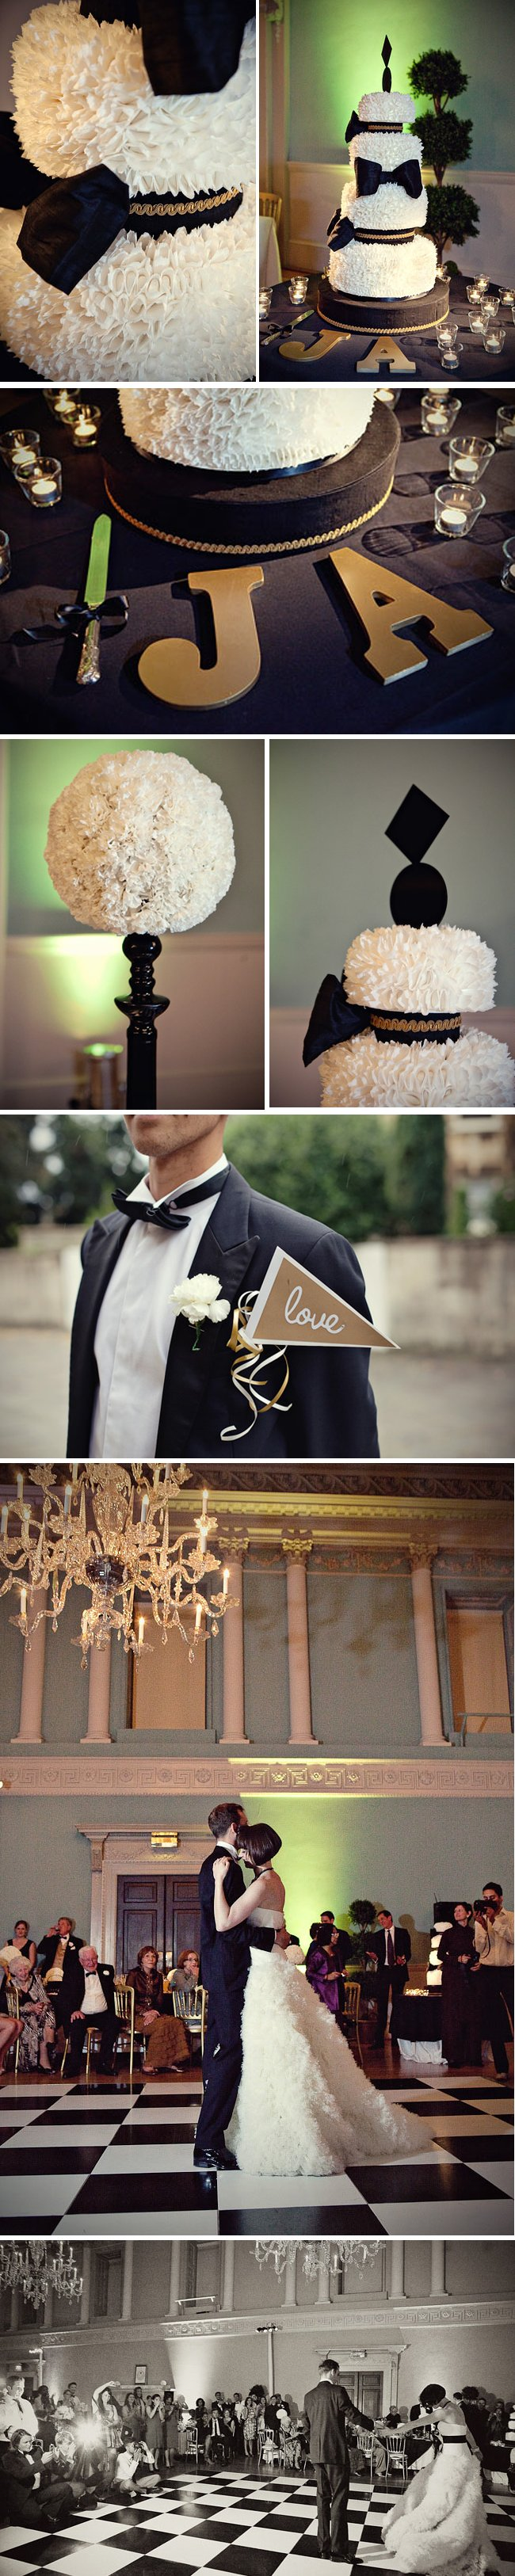 elegant black white wedding flowers reception decor vera wang bridal gown